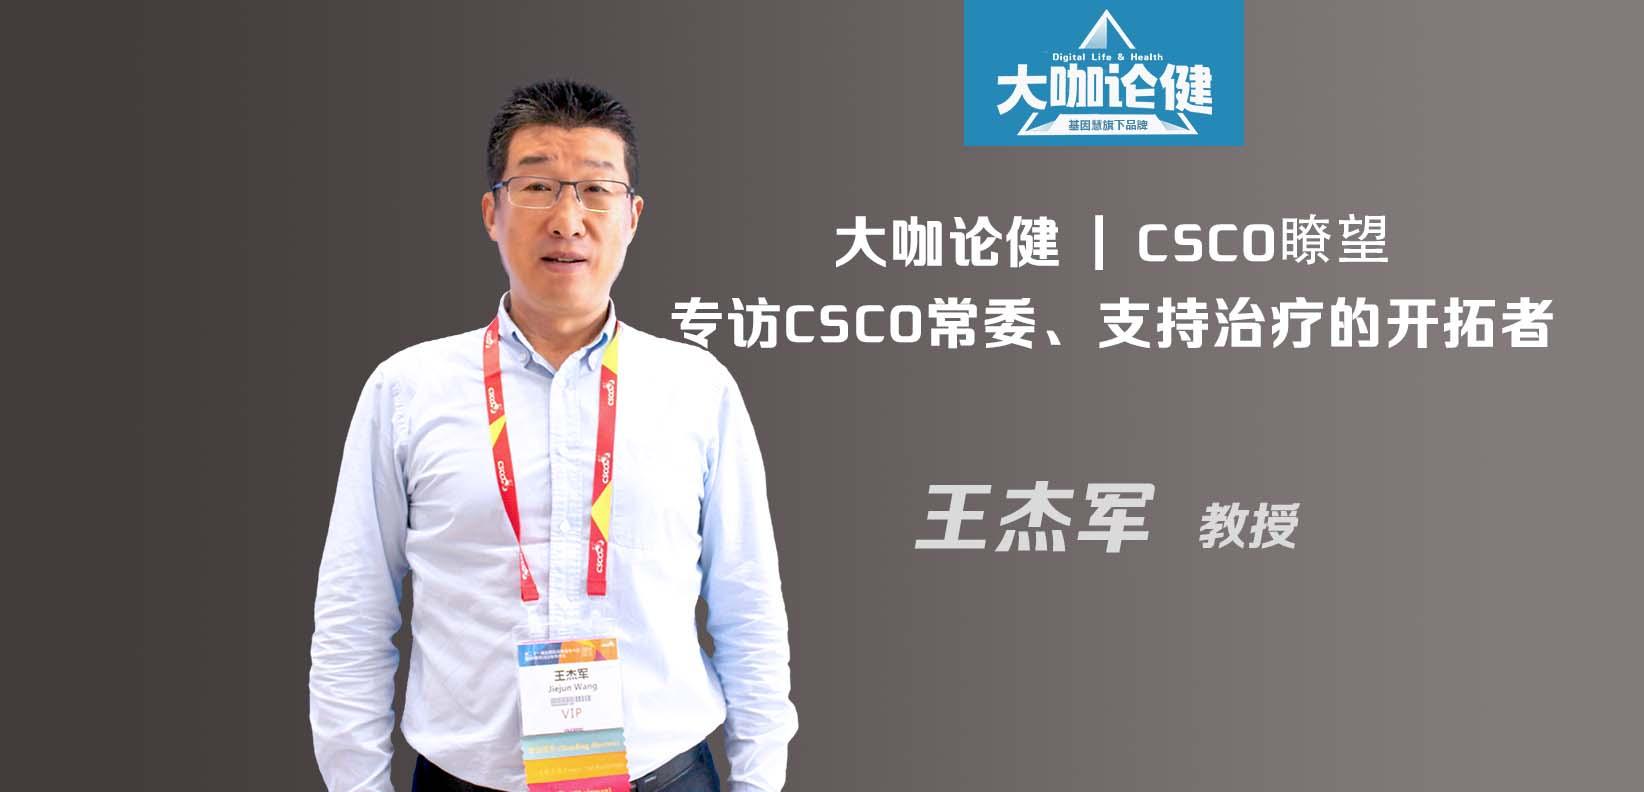 CSCO瞭望&大咖论健80期 | 专访CSCO常委、支持治疗的开拓者王杰军教授